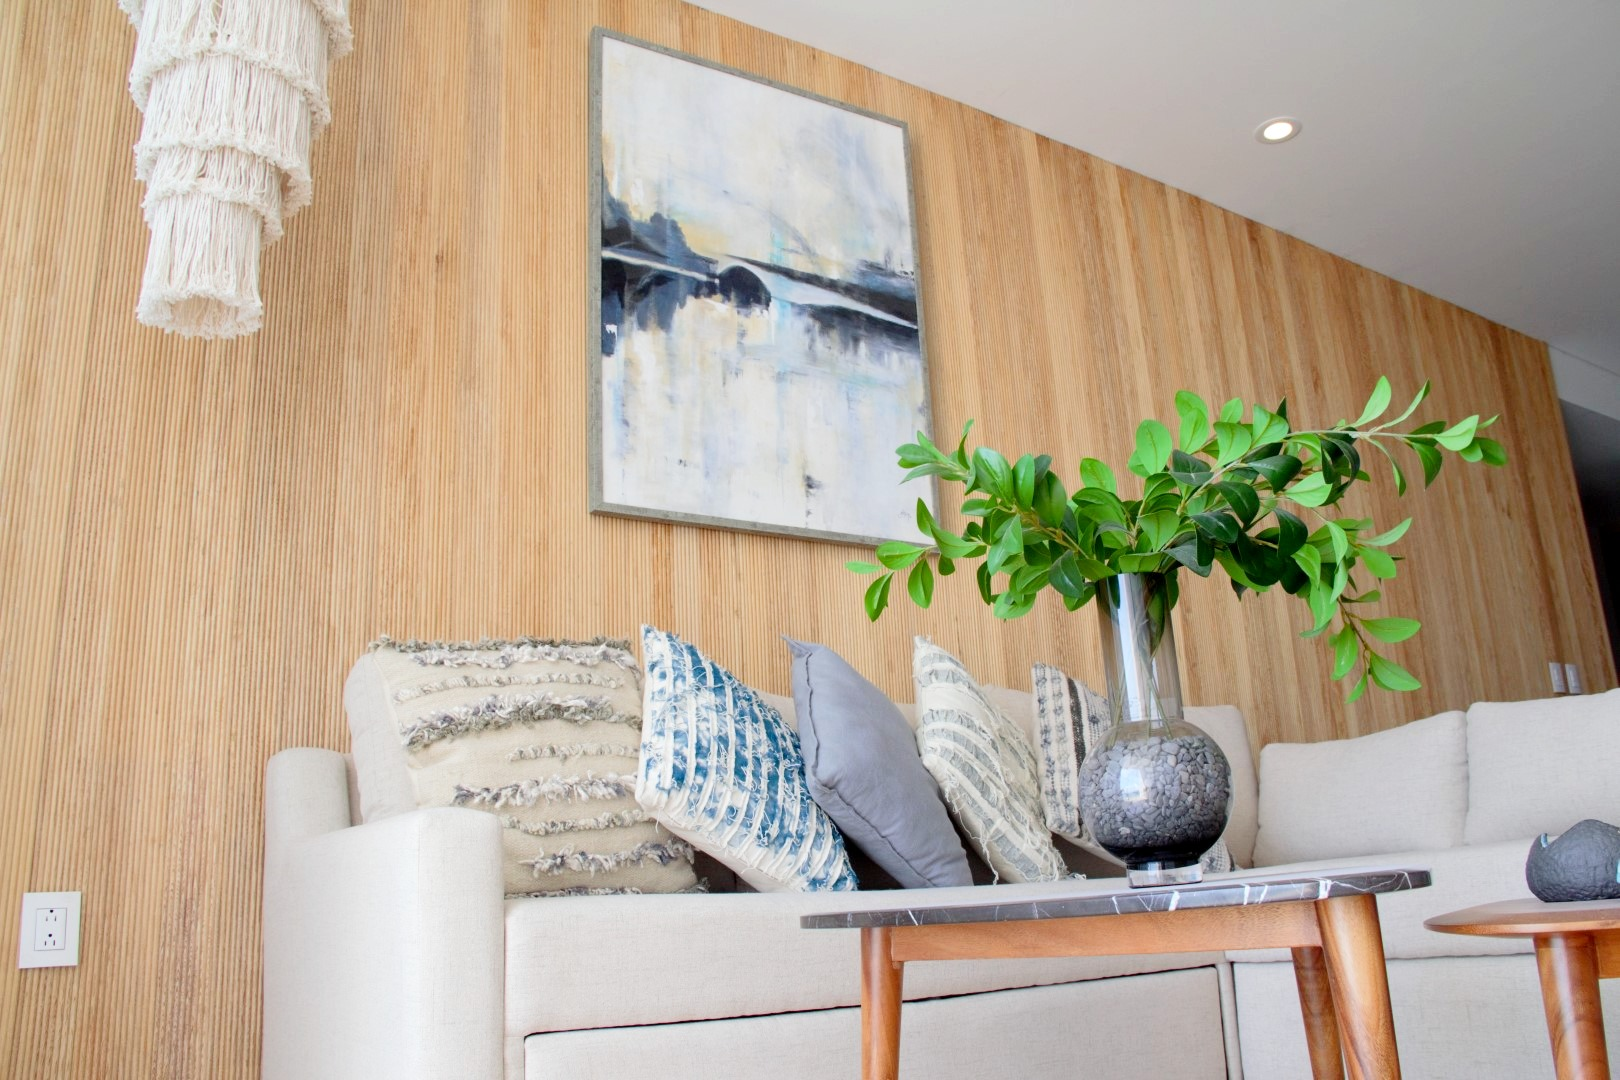 Living room decor.